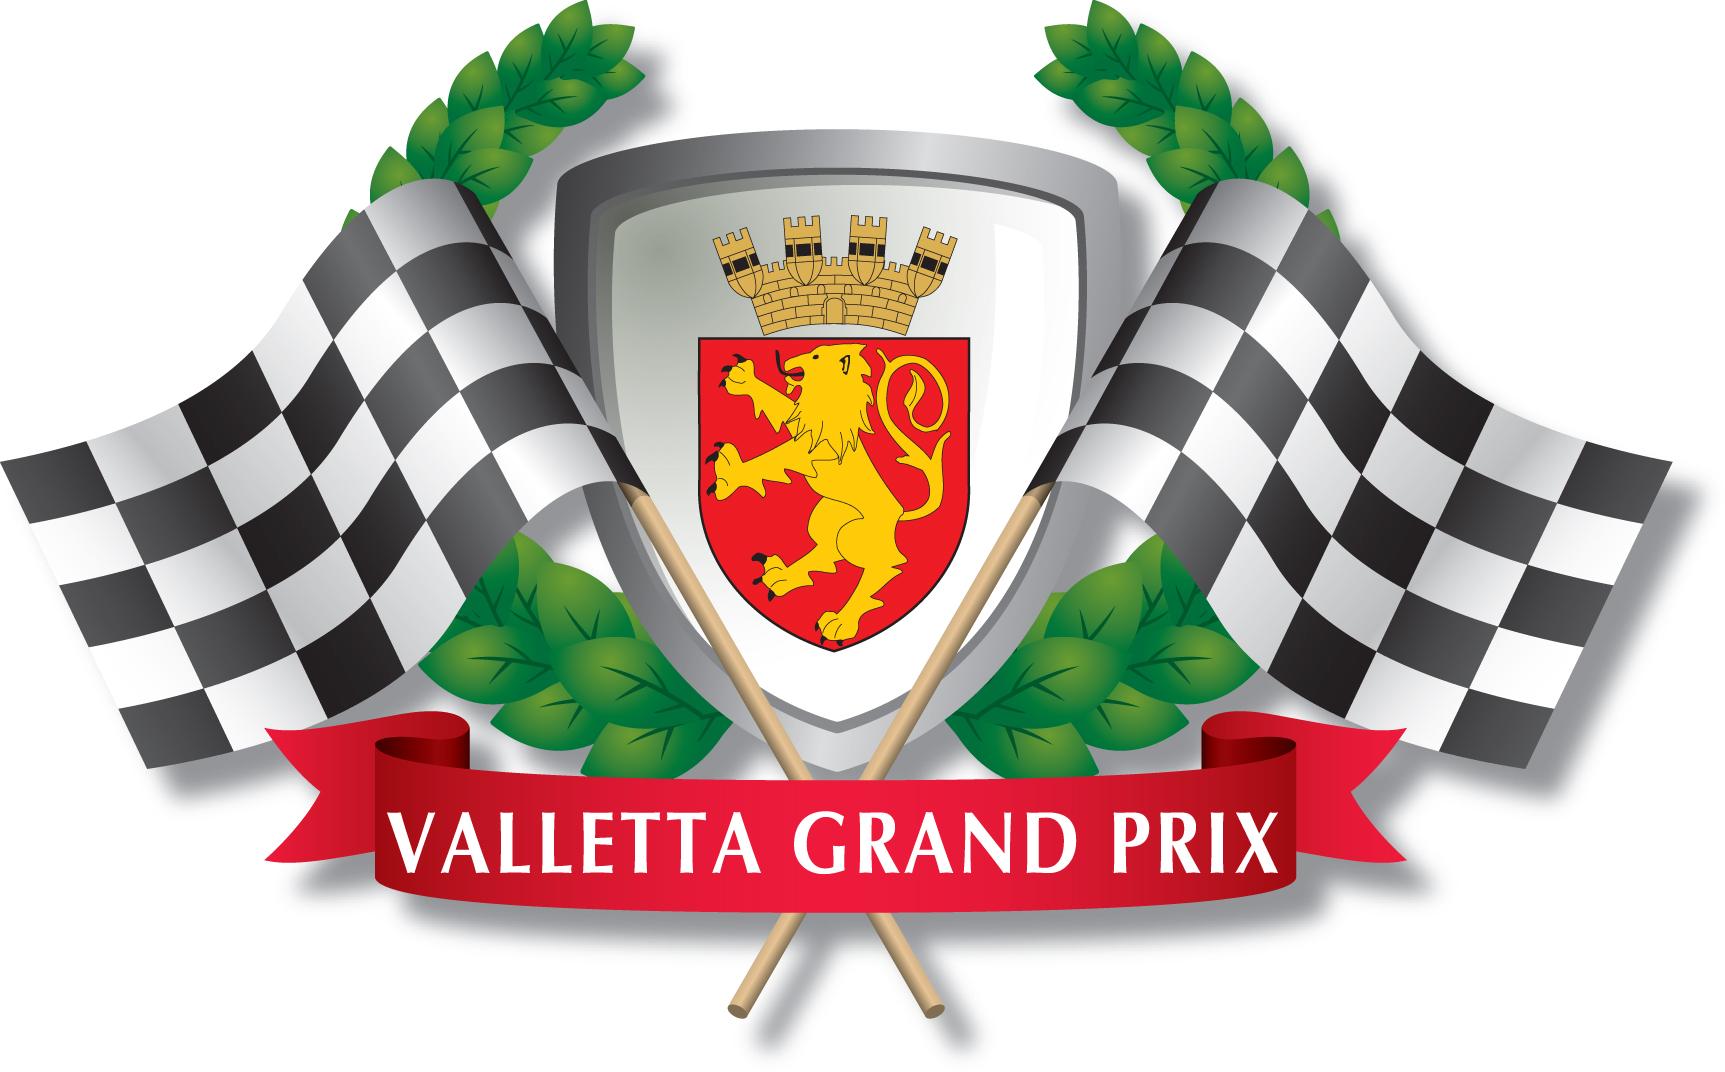 Valletta Grand Prix Logo